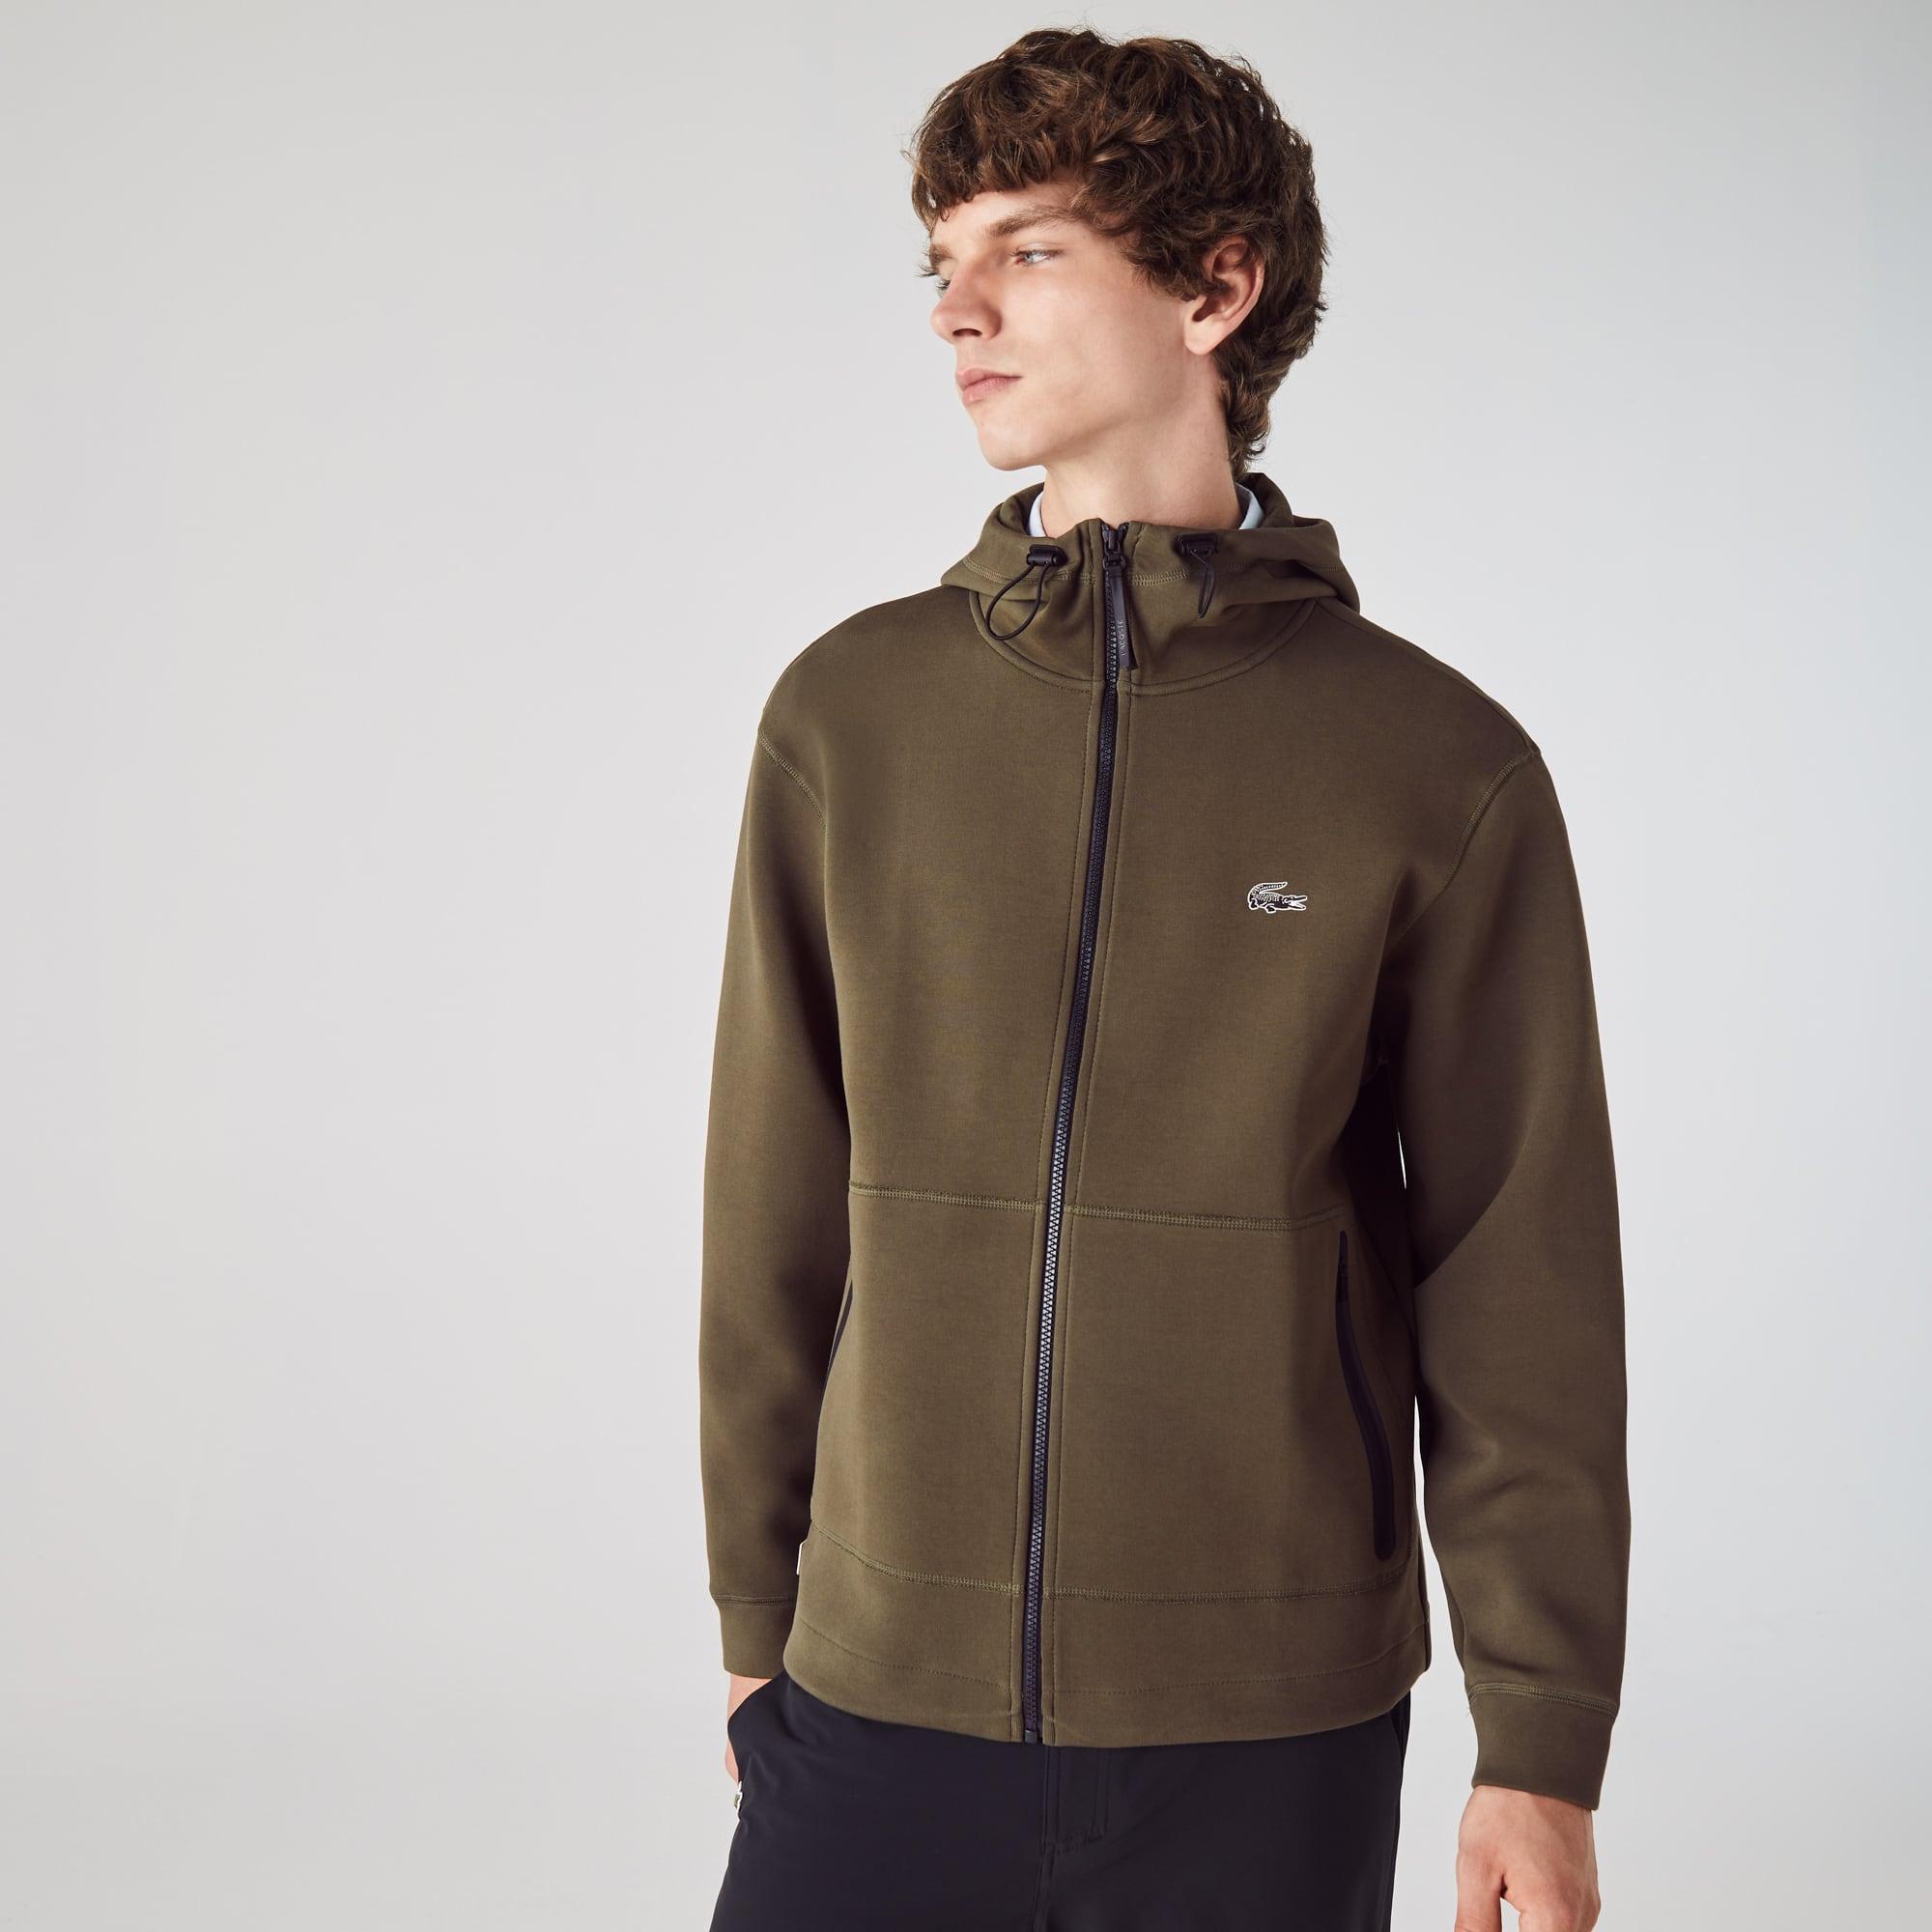 Lacoste Mens Sweat Jacket zipjacke Jacket Hoodie Navy Blue New RRP 129 €